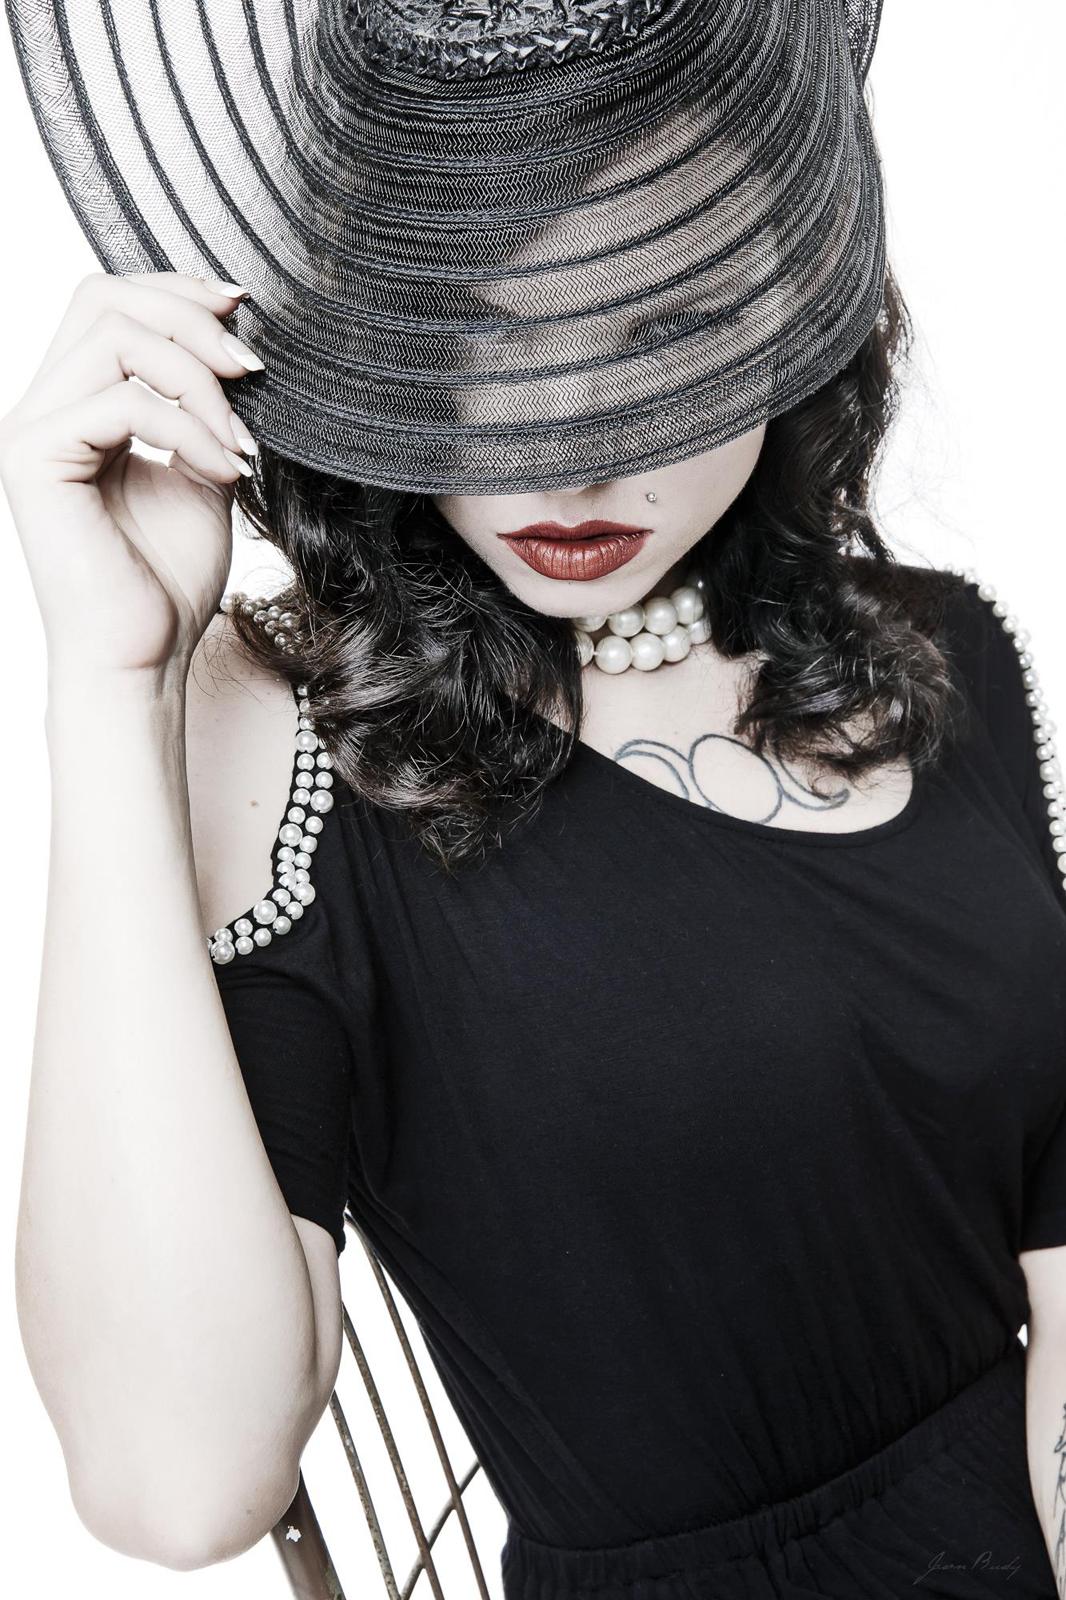 Jason Busby - Lace Grainger - hair Marc Anthony Godsey - makeup Meghan Rae - headpiece Miss G Designs